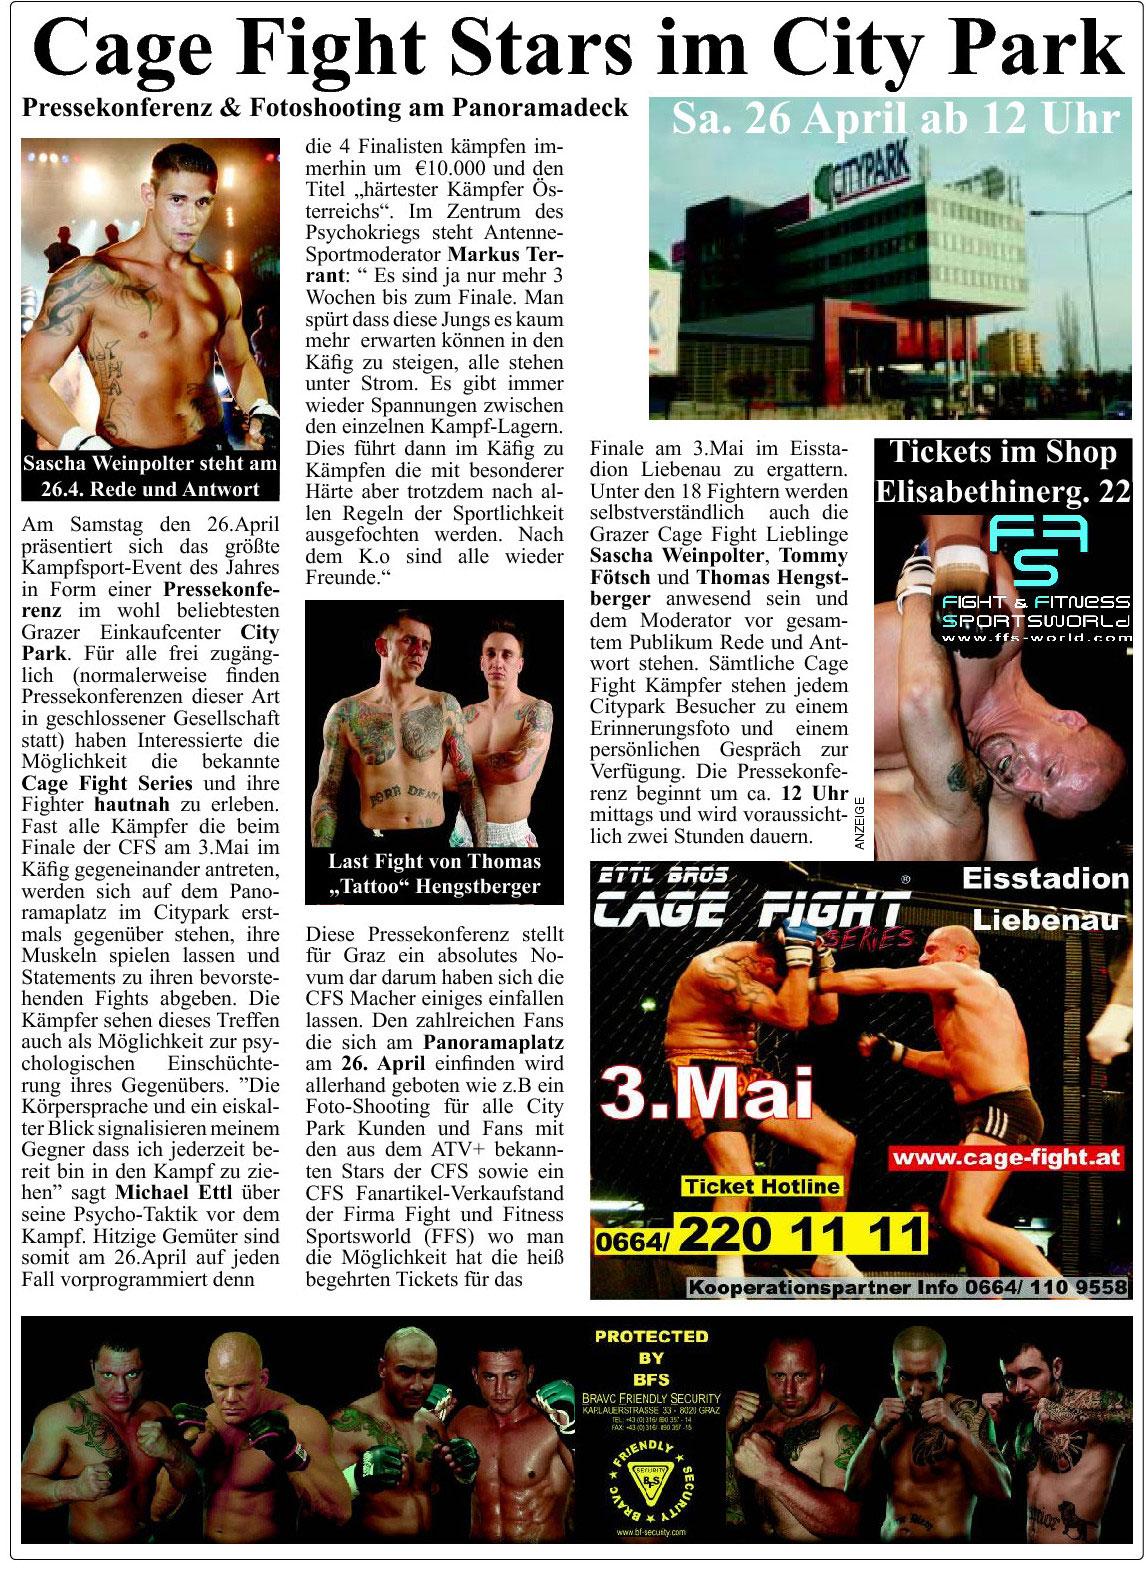 Der Grazer 20. April 2008